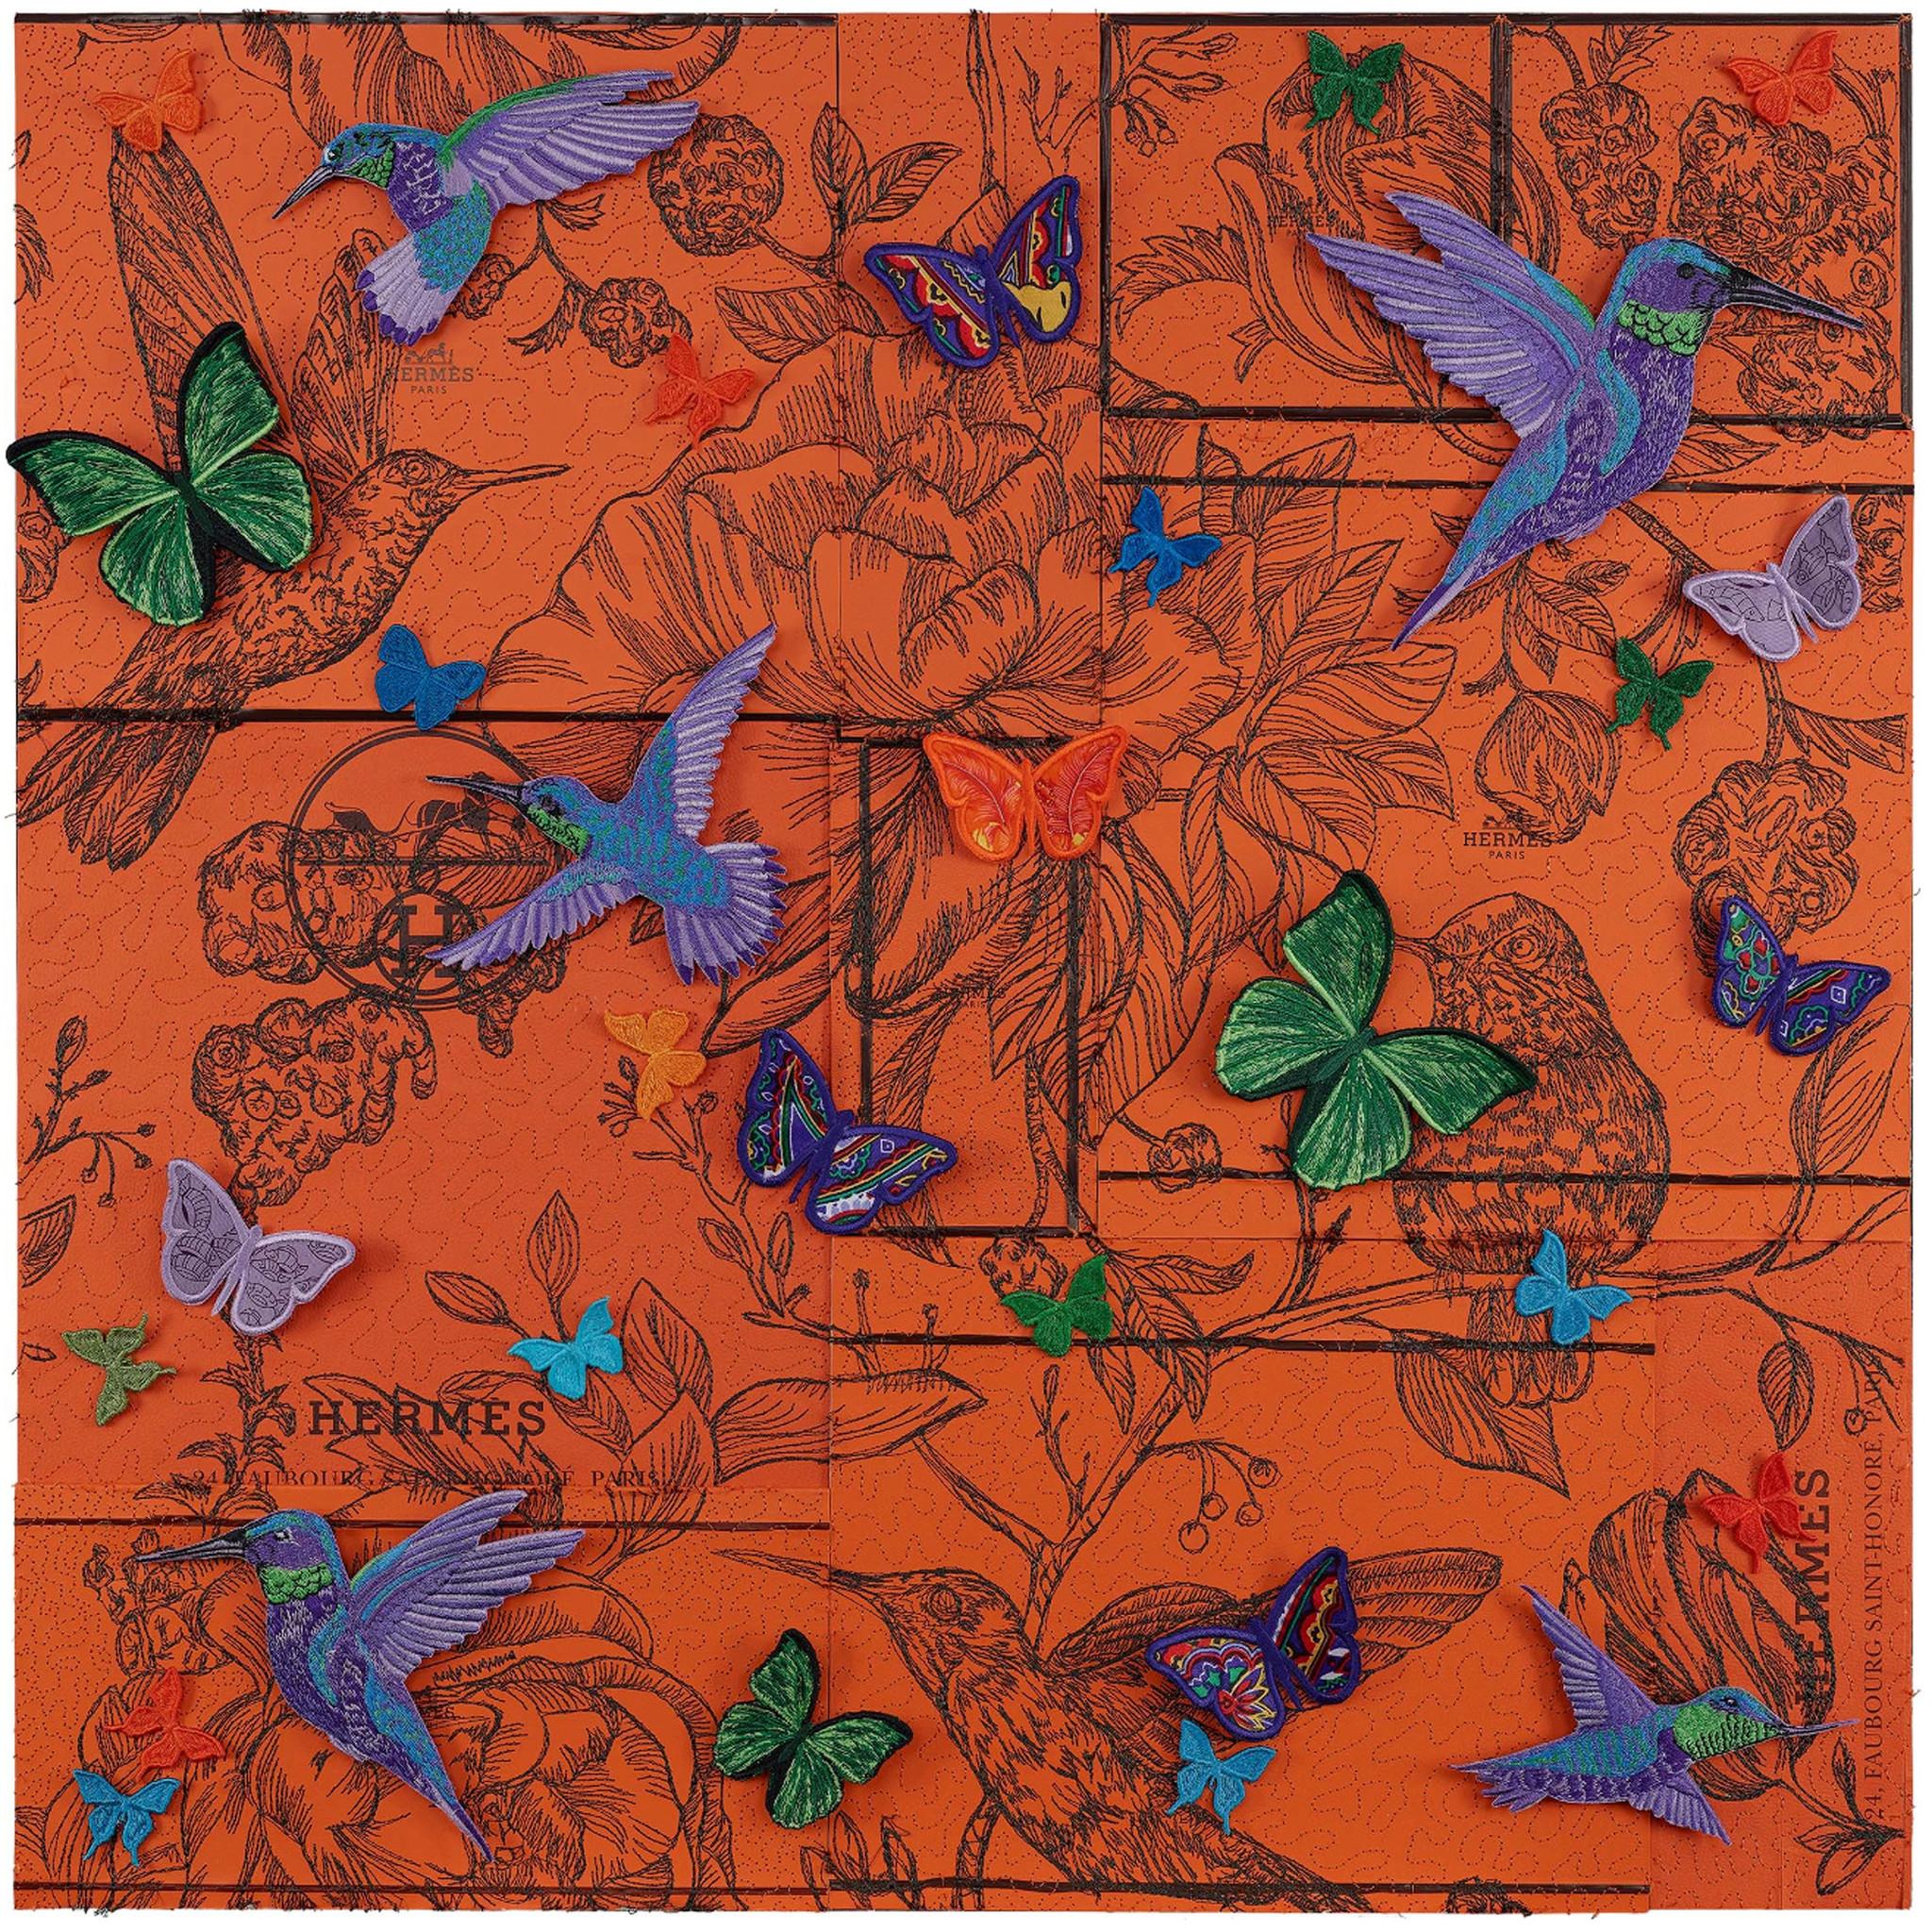 Hermes Hummingbird